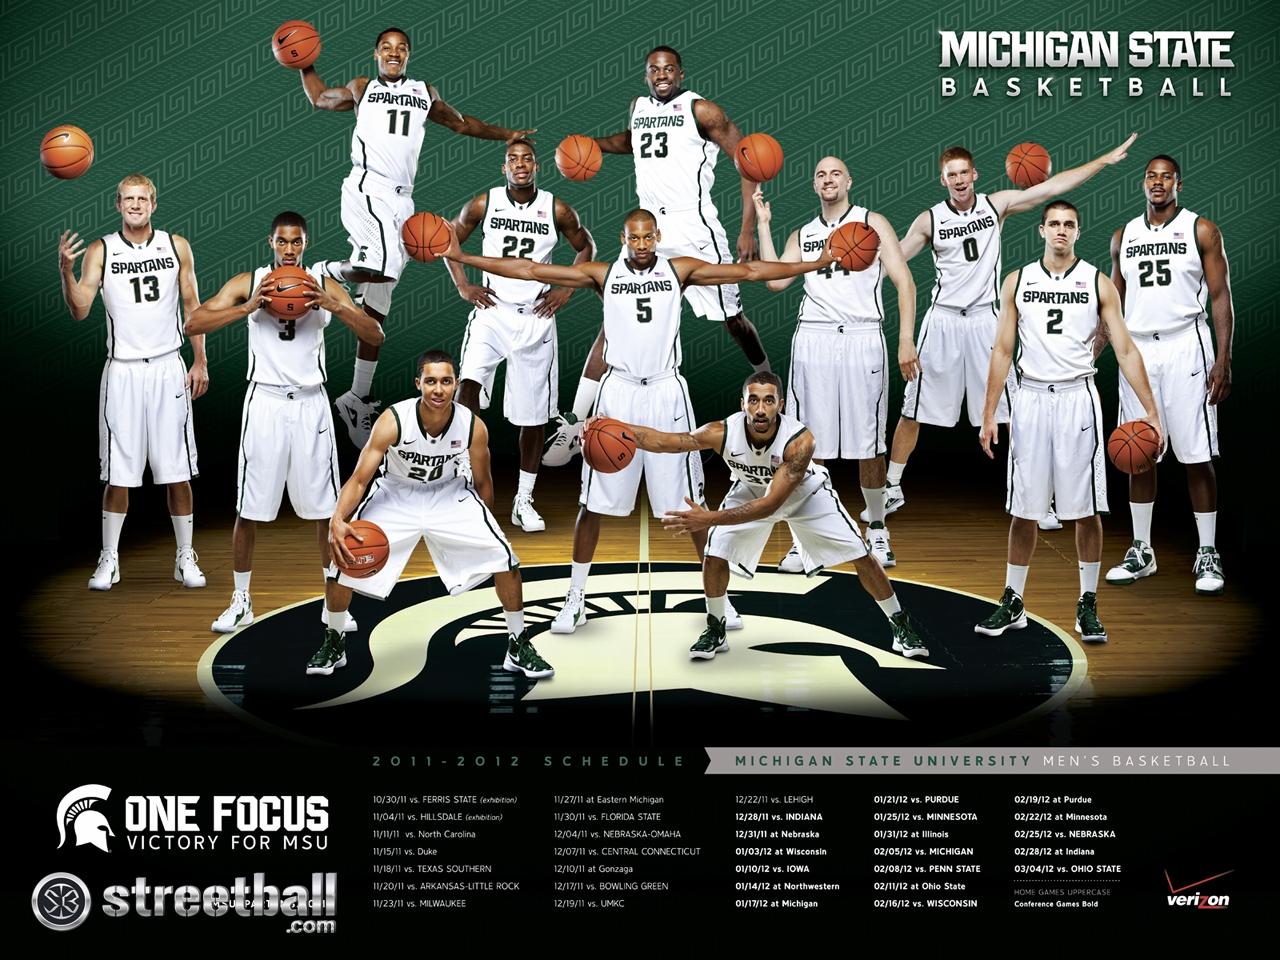 michigan state basketball wallpaper | epic car wallpapers